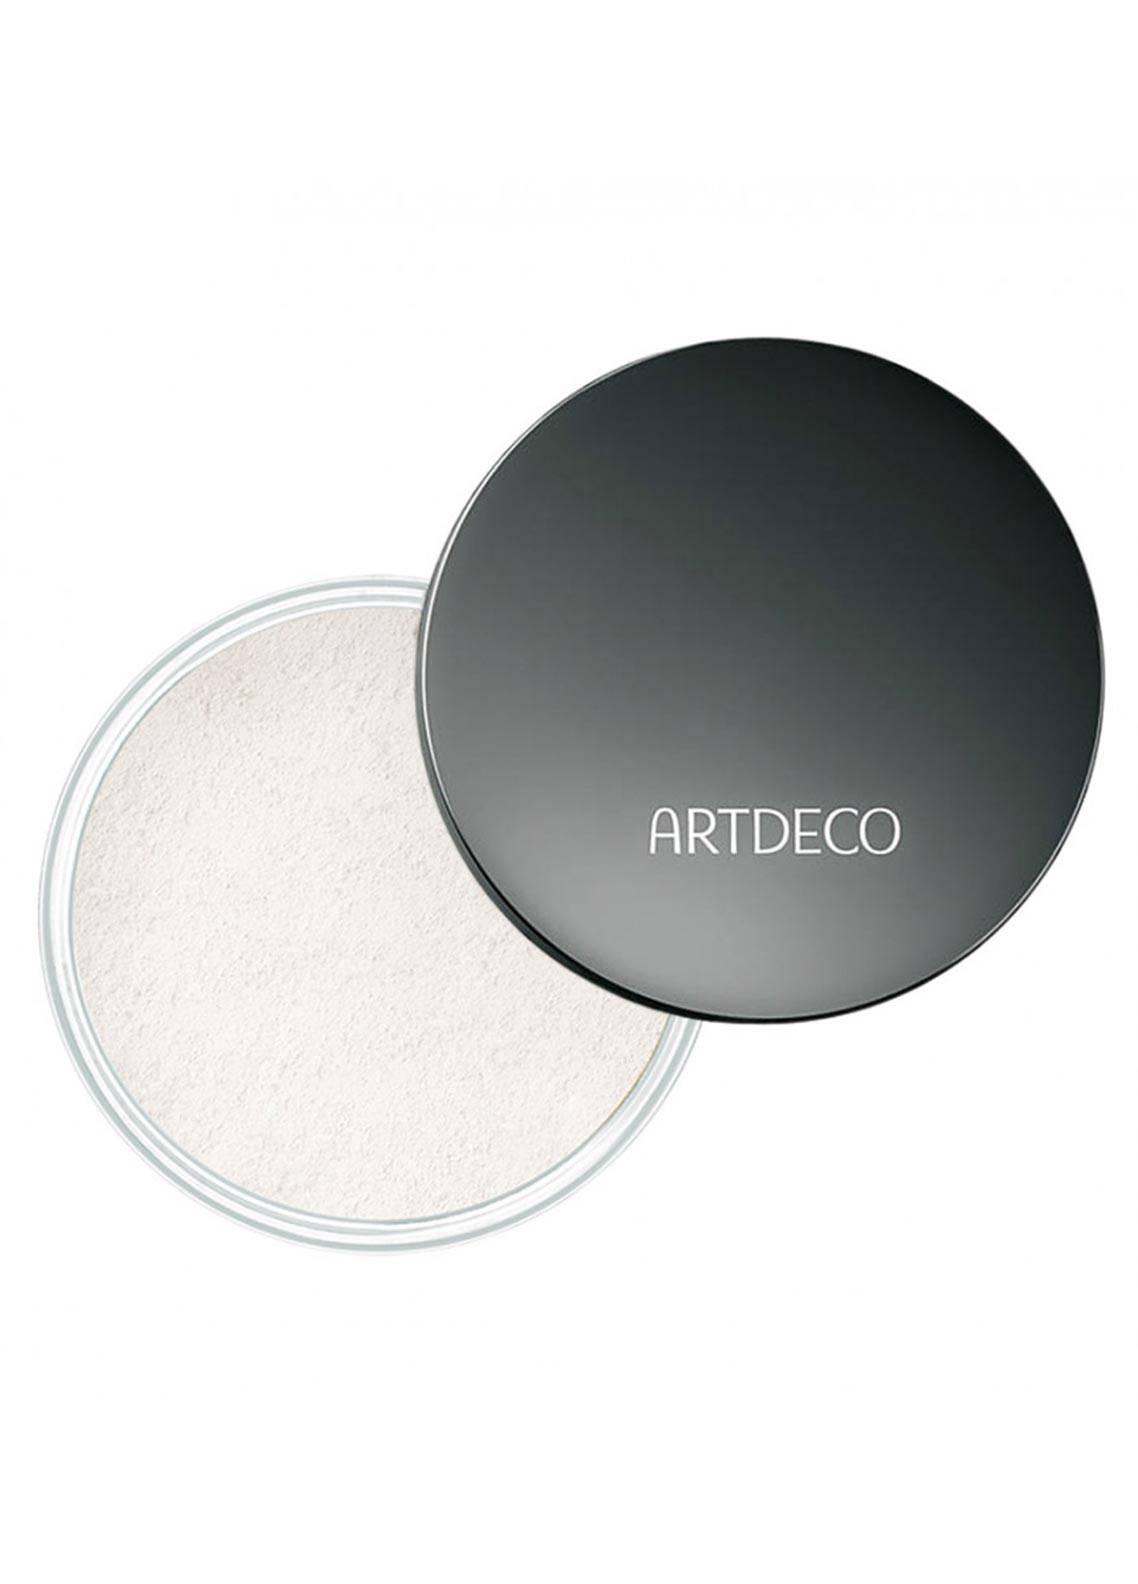 Artdeco Fixing Powder Water Proof Camouflage